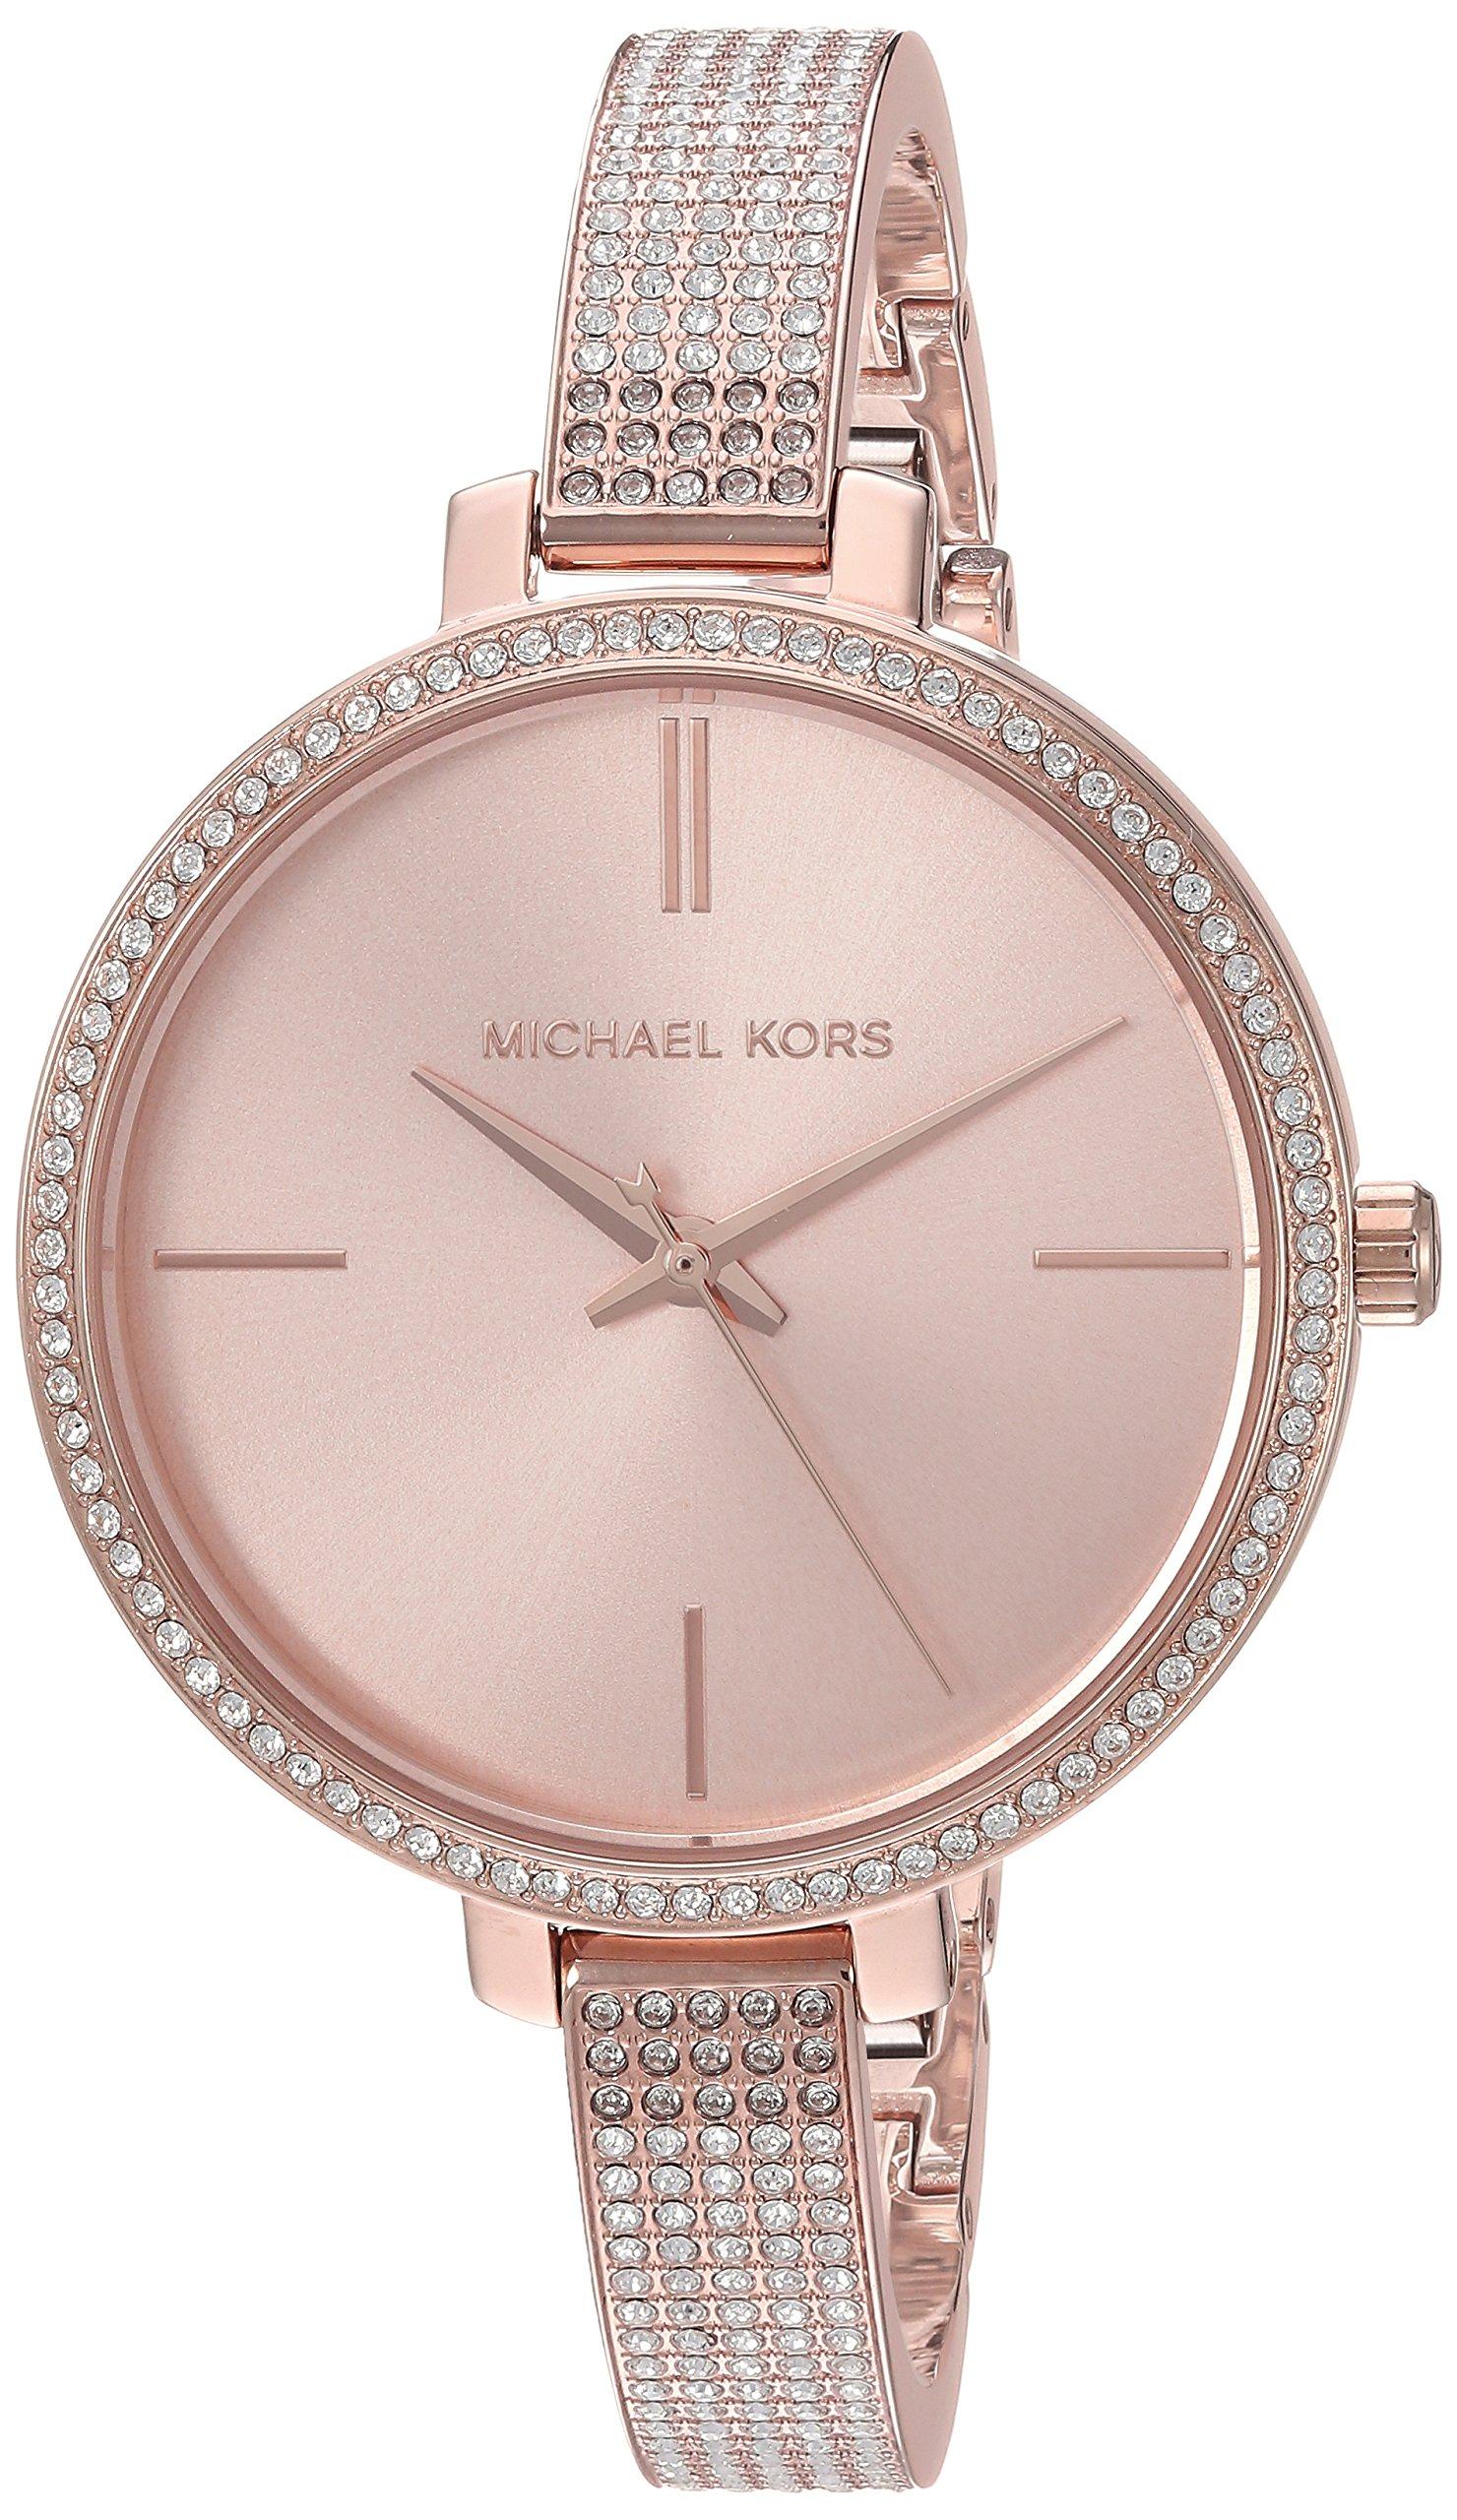 Michael Kors Women's 'Jaryn' Quartz Stainless Steel Casual Watch, Color:Rose Gold-Toned (Model: MK3785)